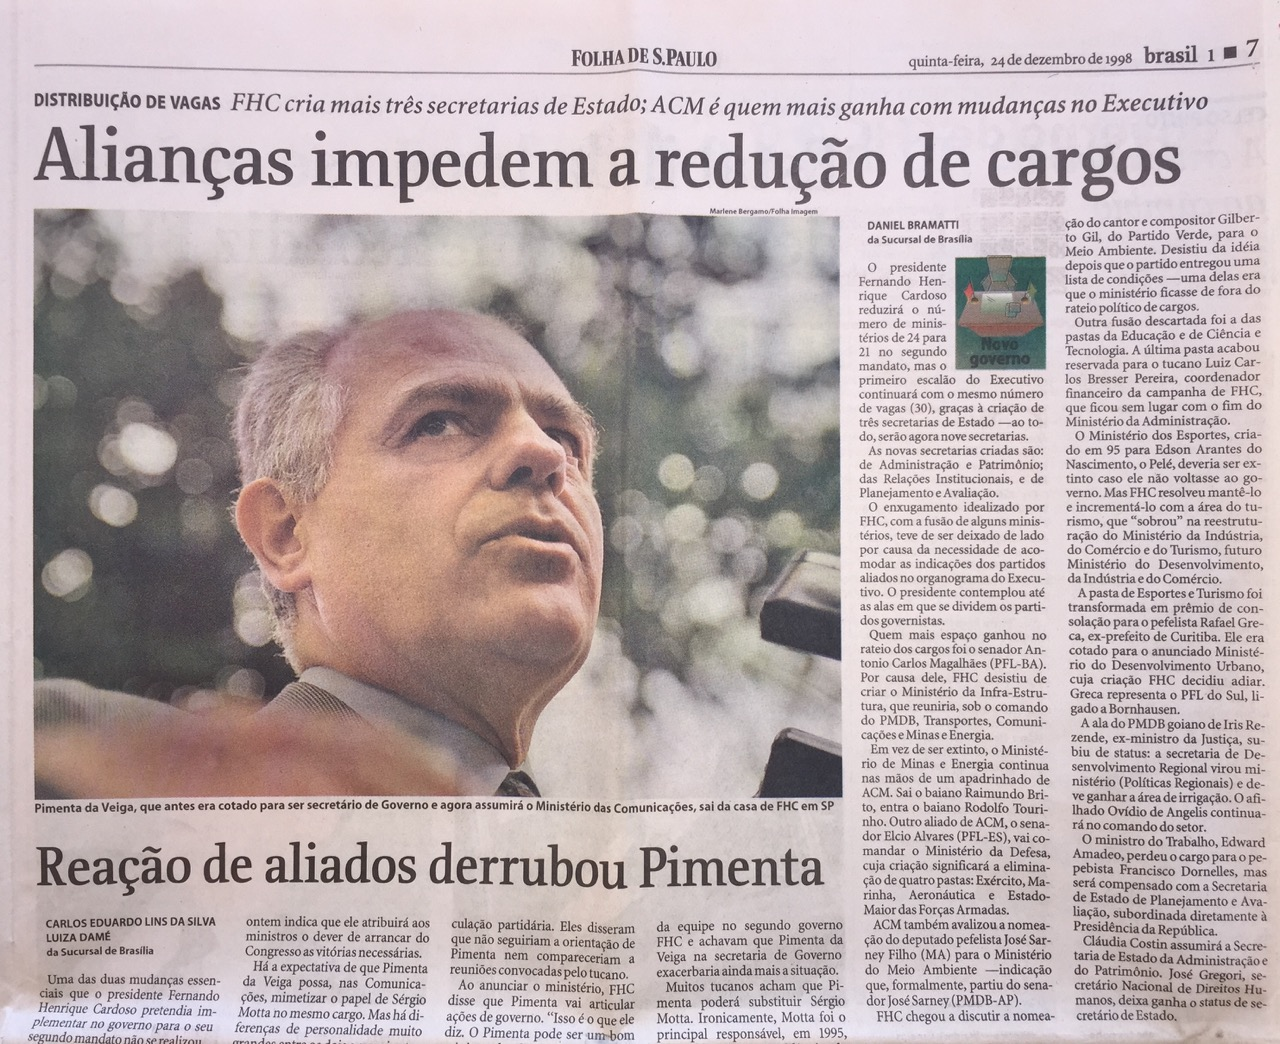 Folha-7a-pagina-24dez1998